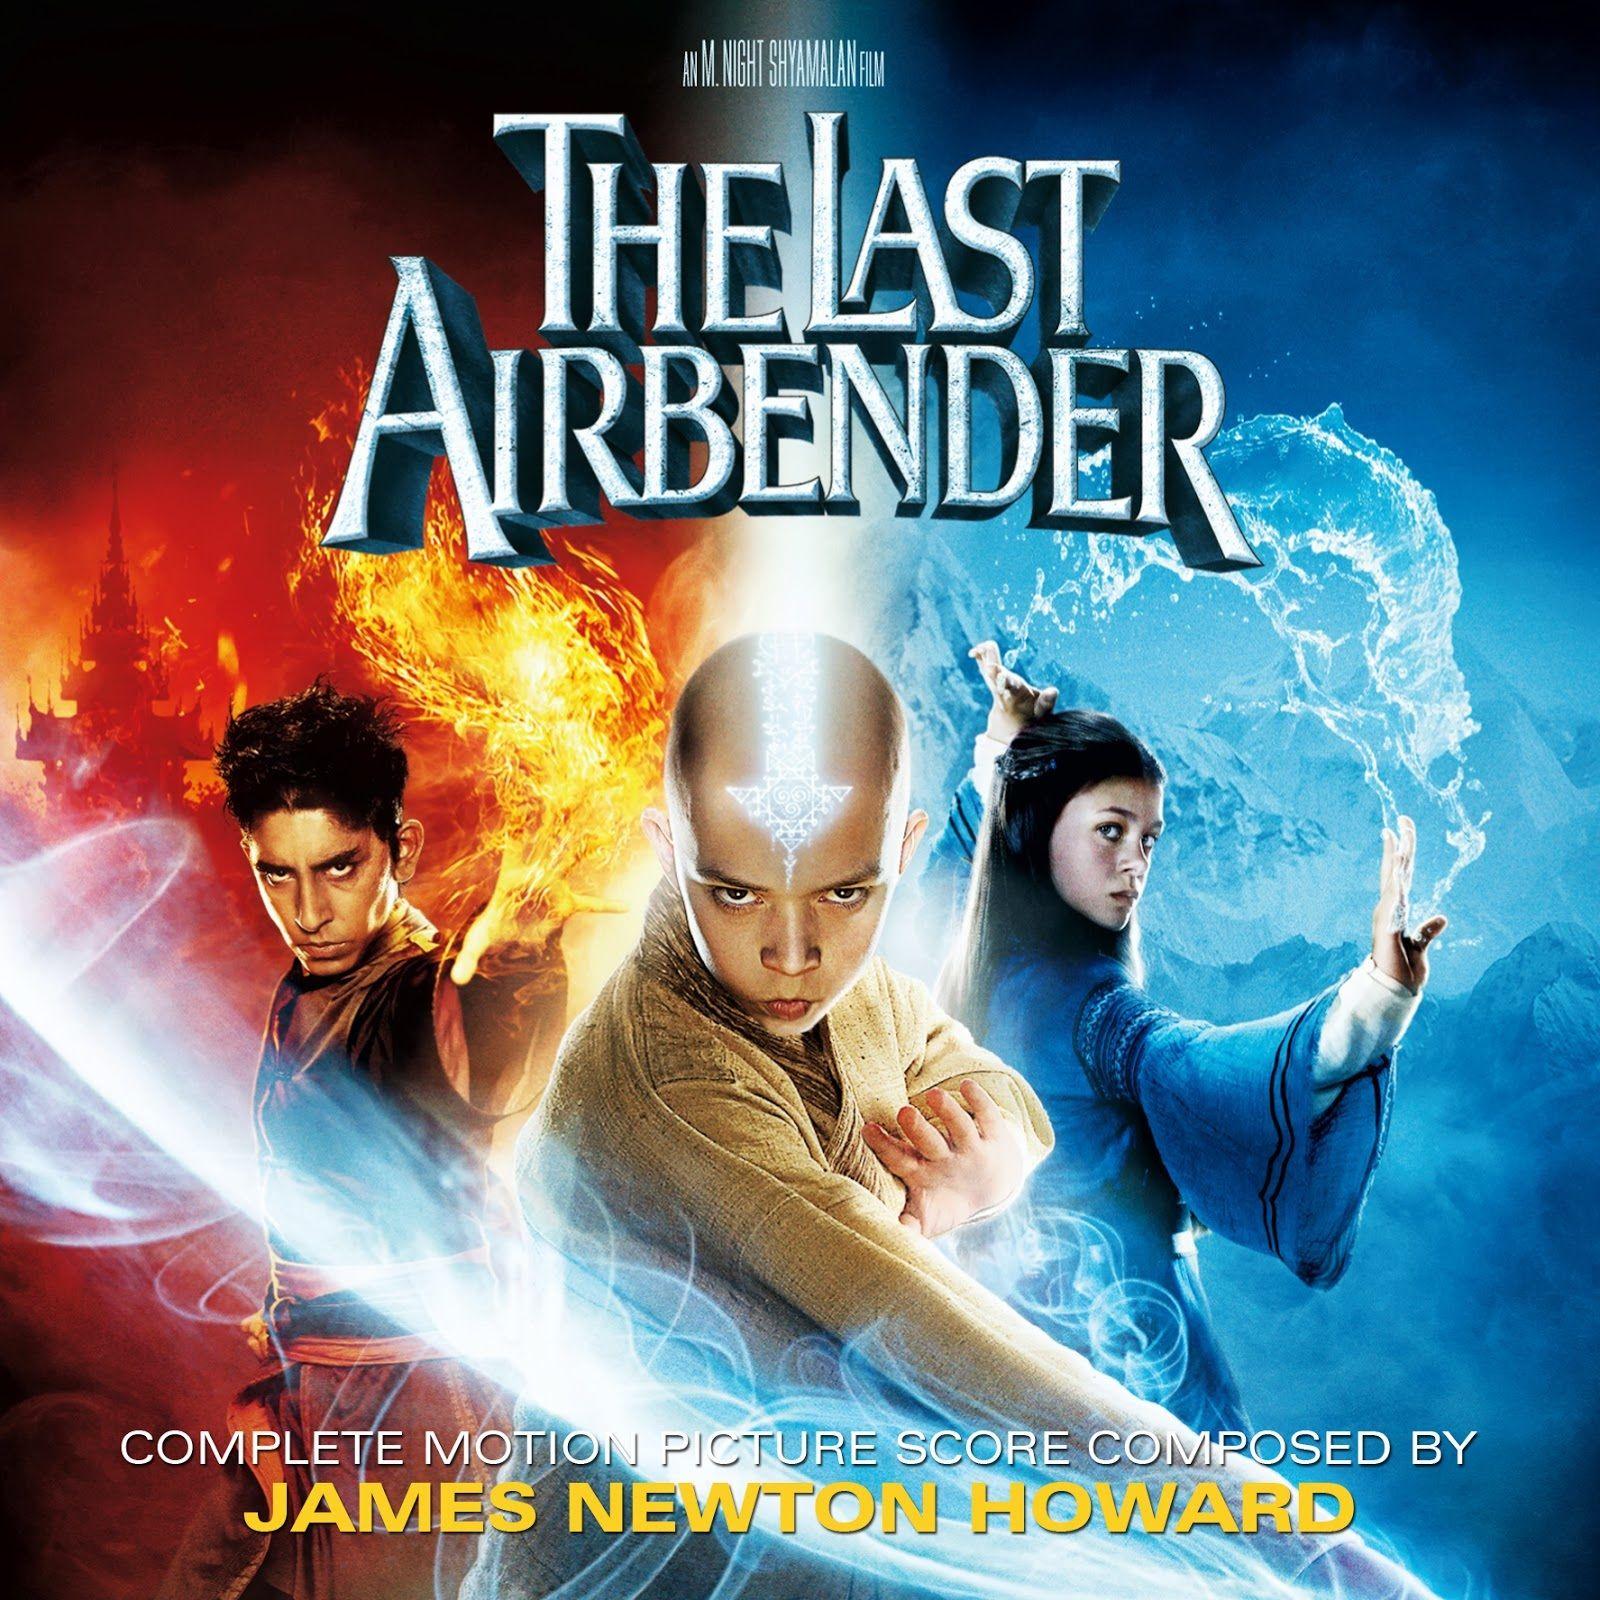 Avatar Le Dernier Maitre De L Air 2 Streaming Vf Check ... The Last Airbender 2 Movie Go Stream